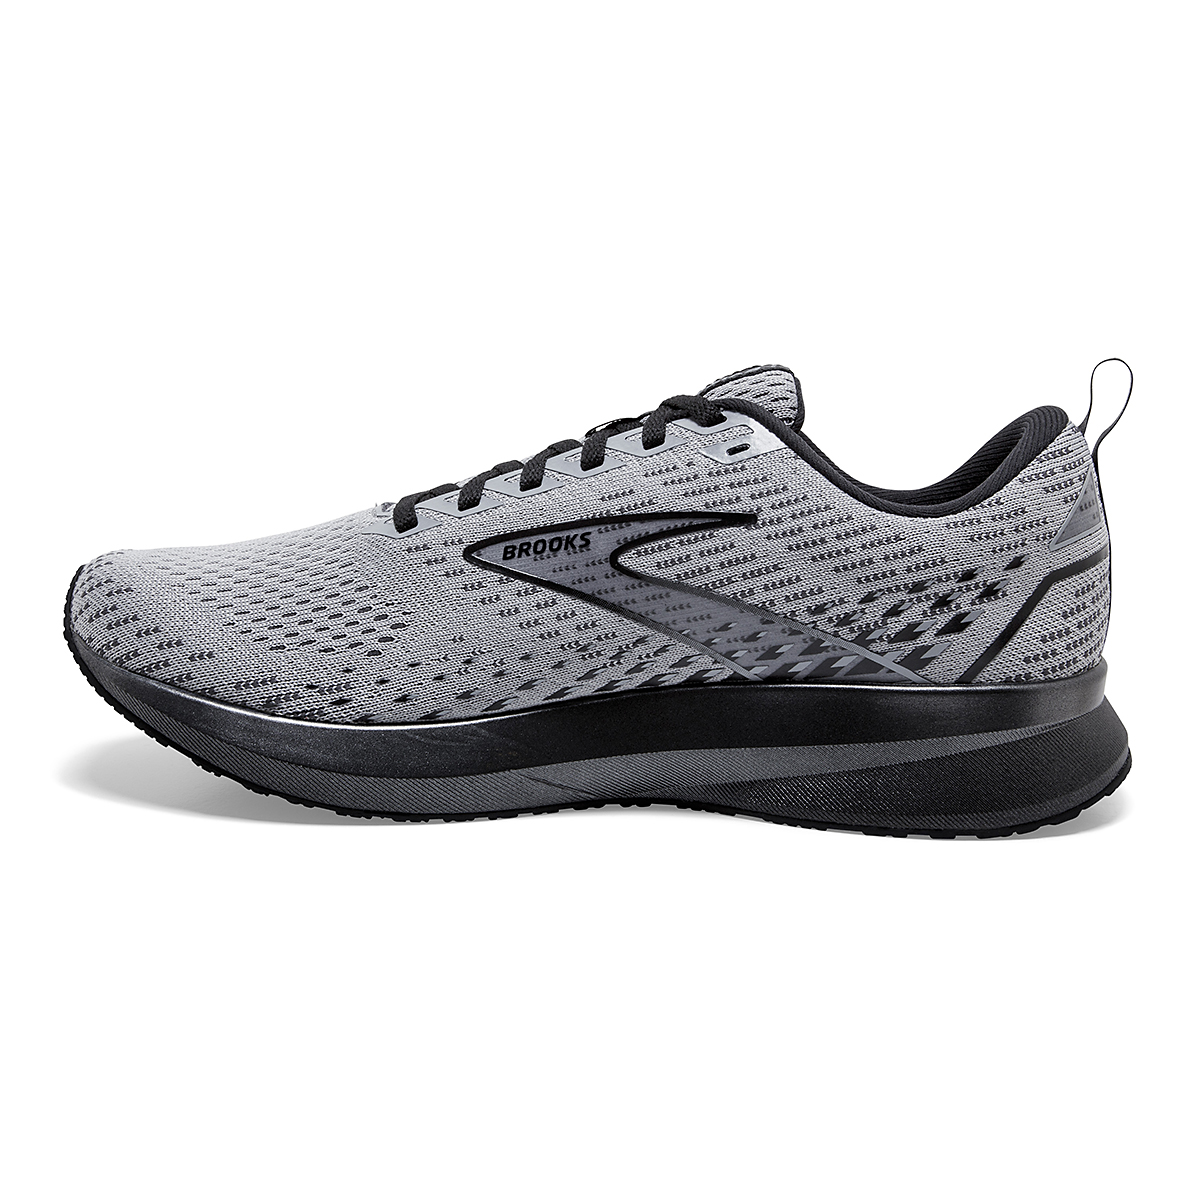 Men's Brooks Levitate 5 Running Shoe - Color: Grey/Blackened - Size: 7 - Width: Regular, Grey/Blackened, large, image 2